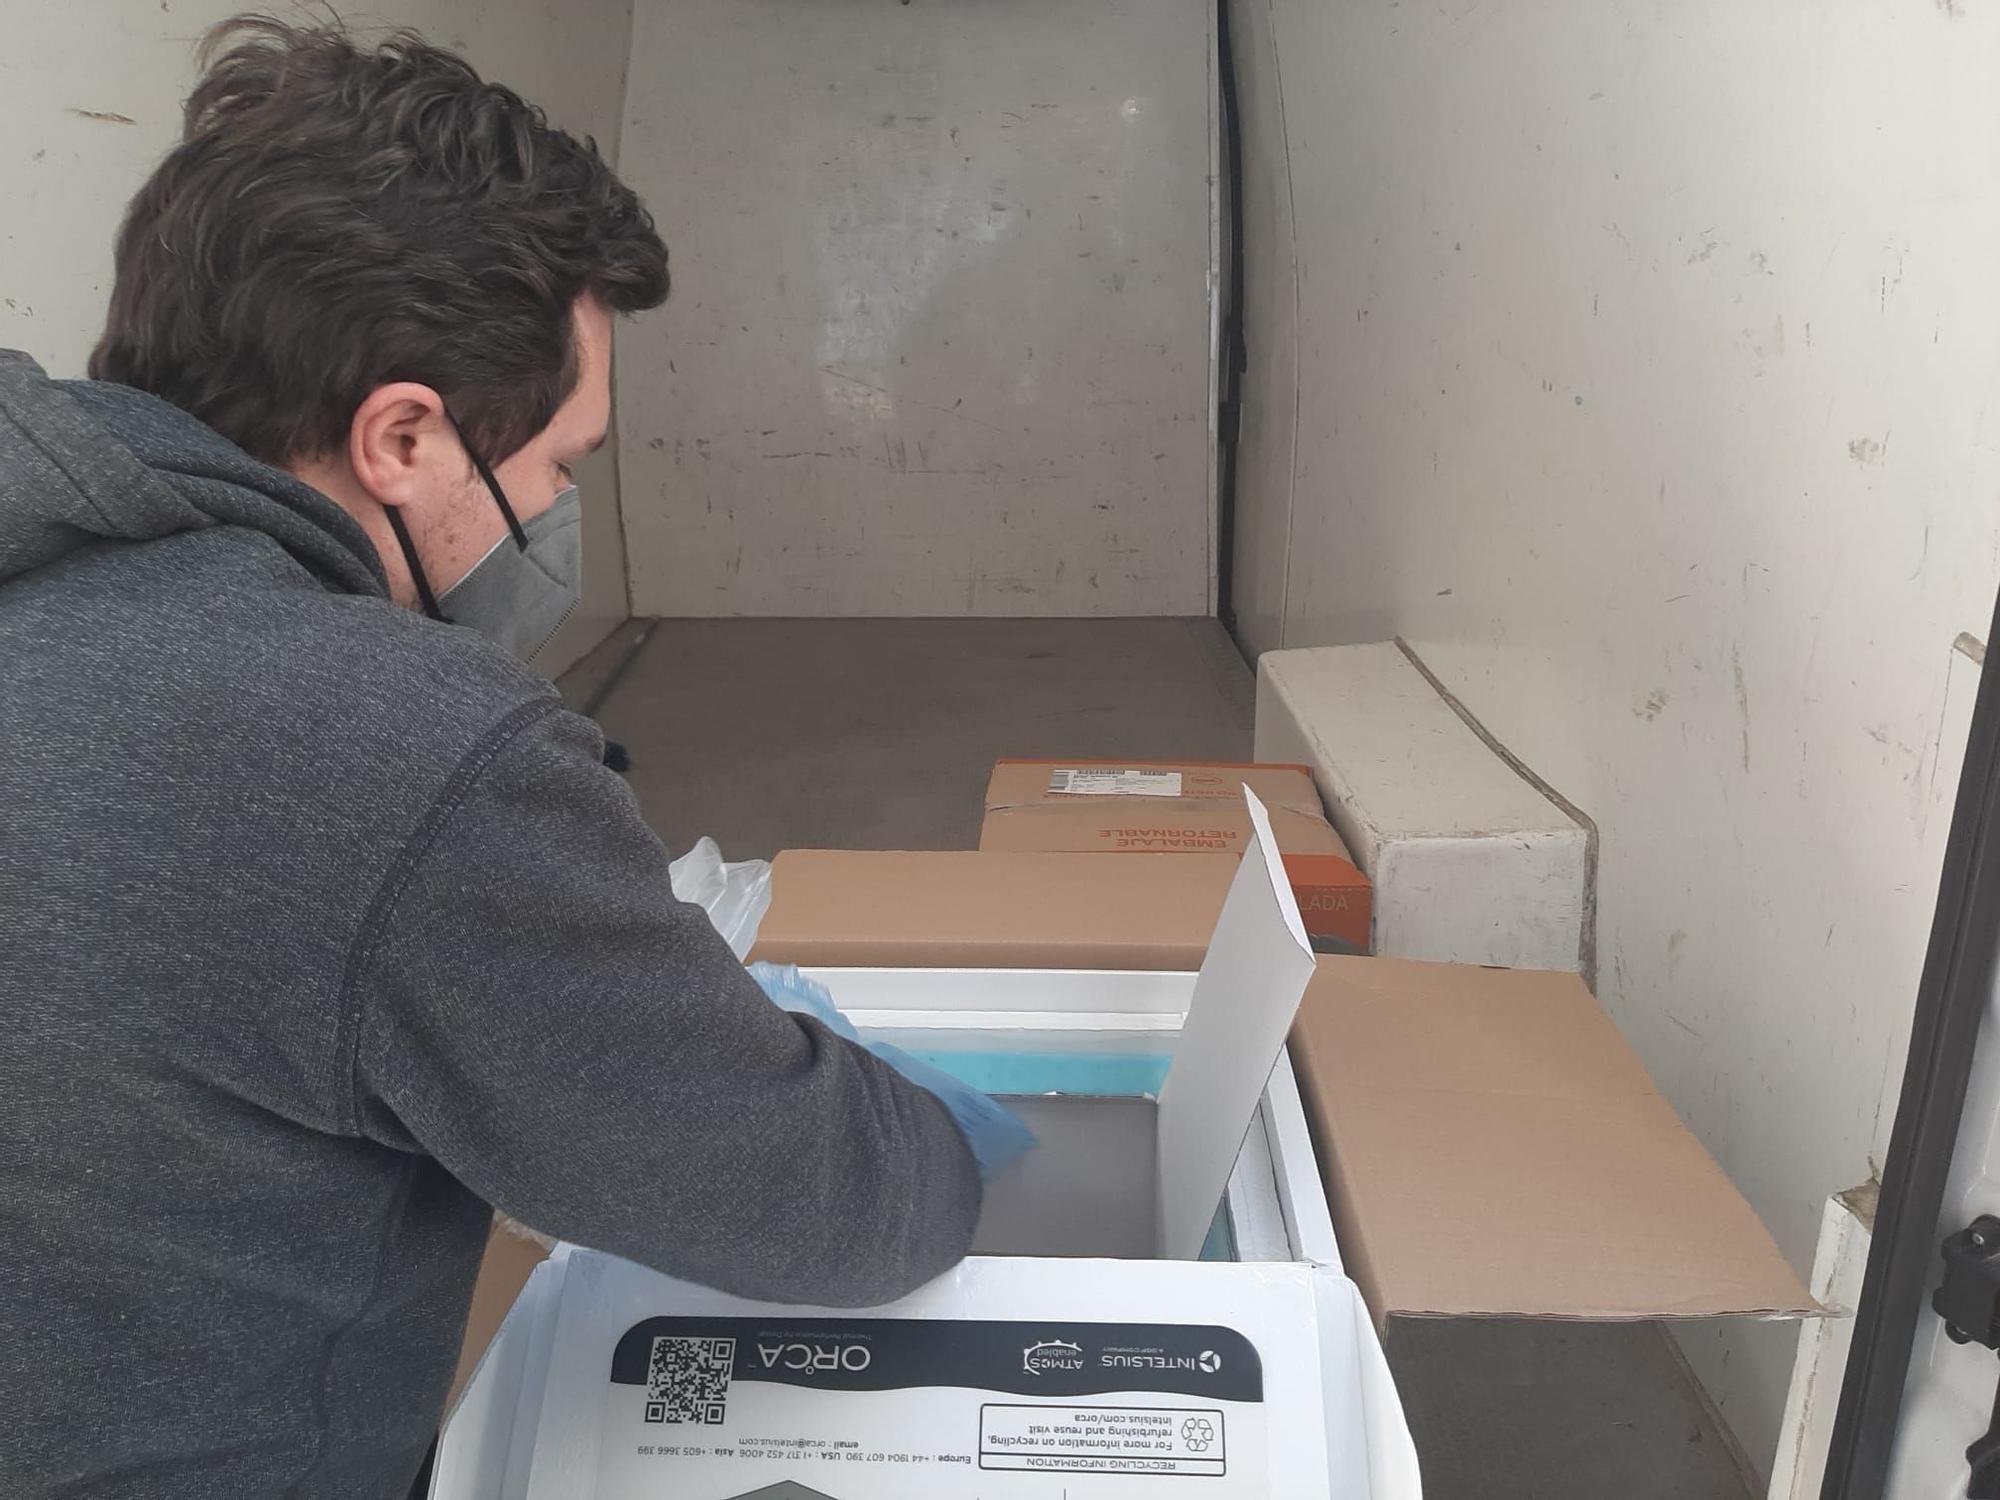 Las primeras dosis de la vacuna de La Moderna llegan a la Comunitat Valenciana